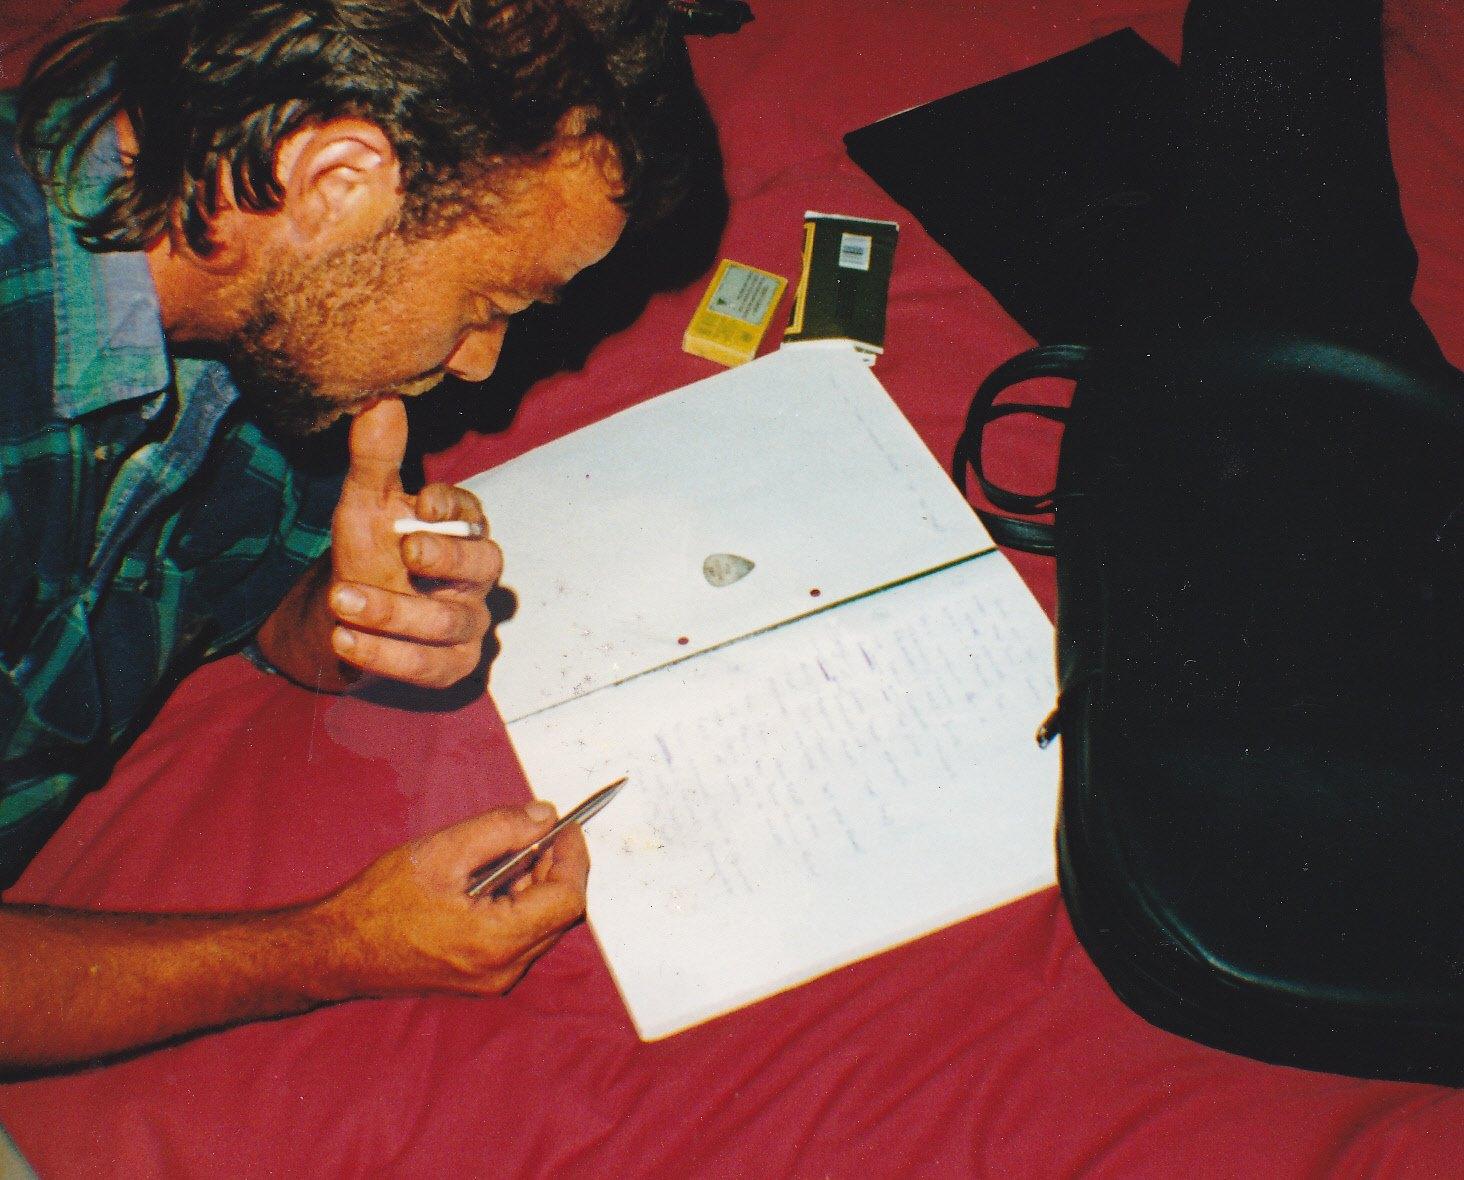 Chris writes a song